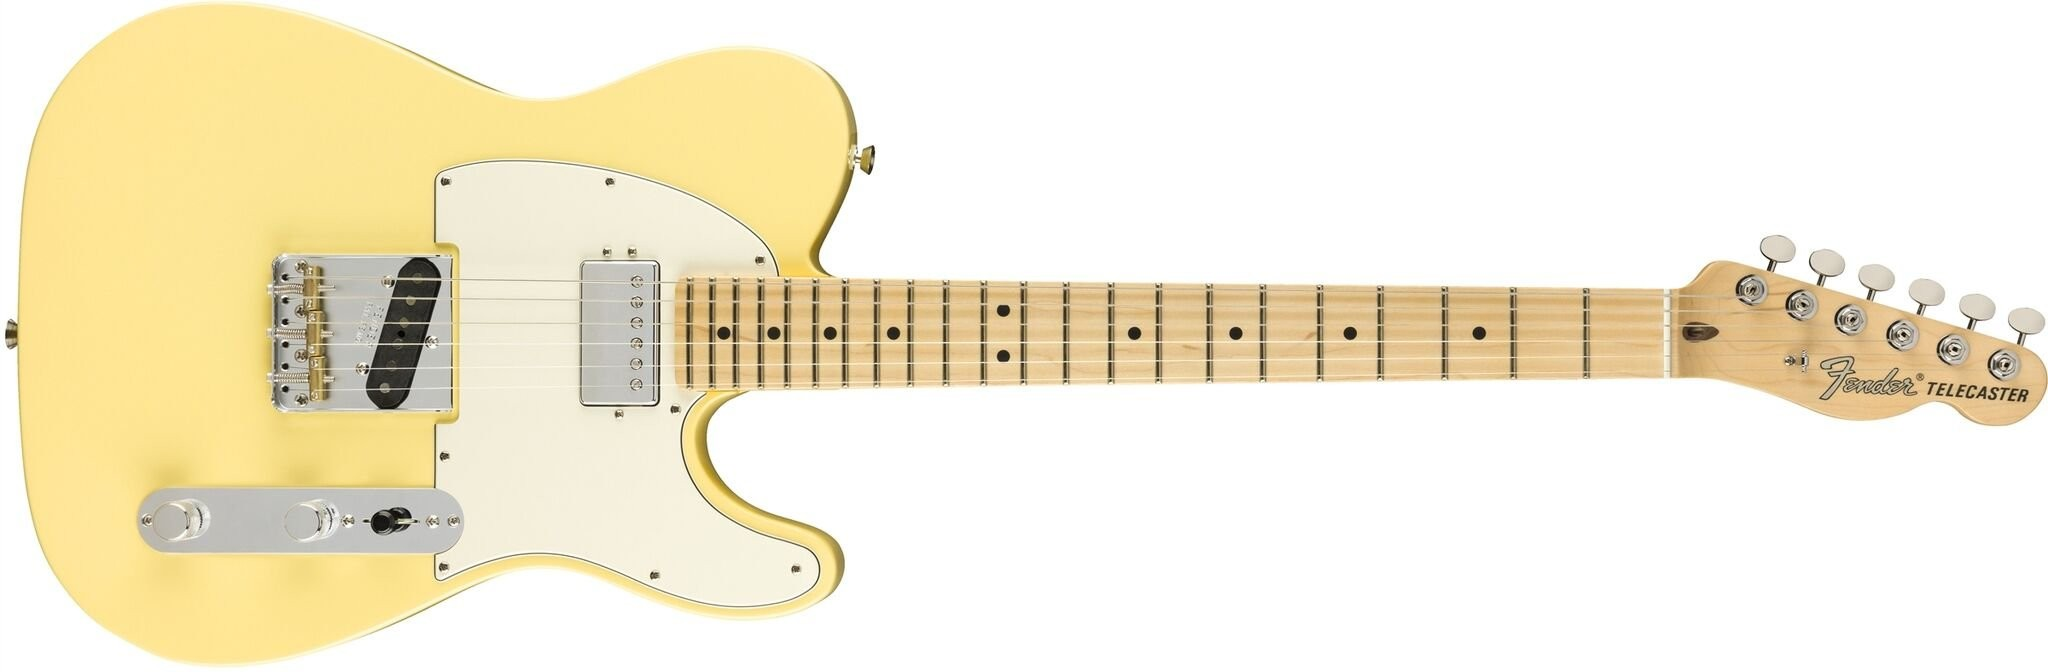 Fender American Performer Series Telecaster HUM